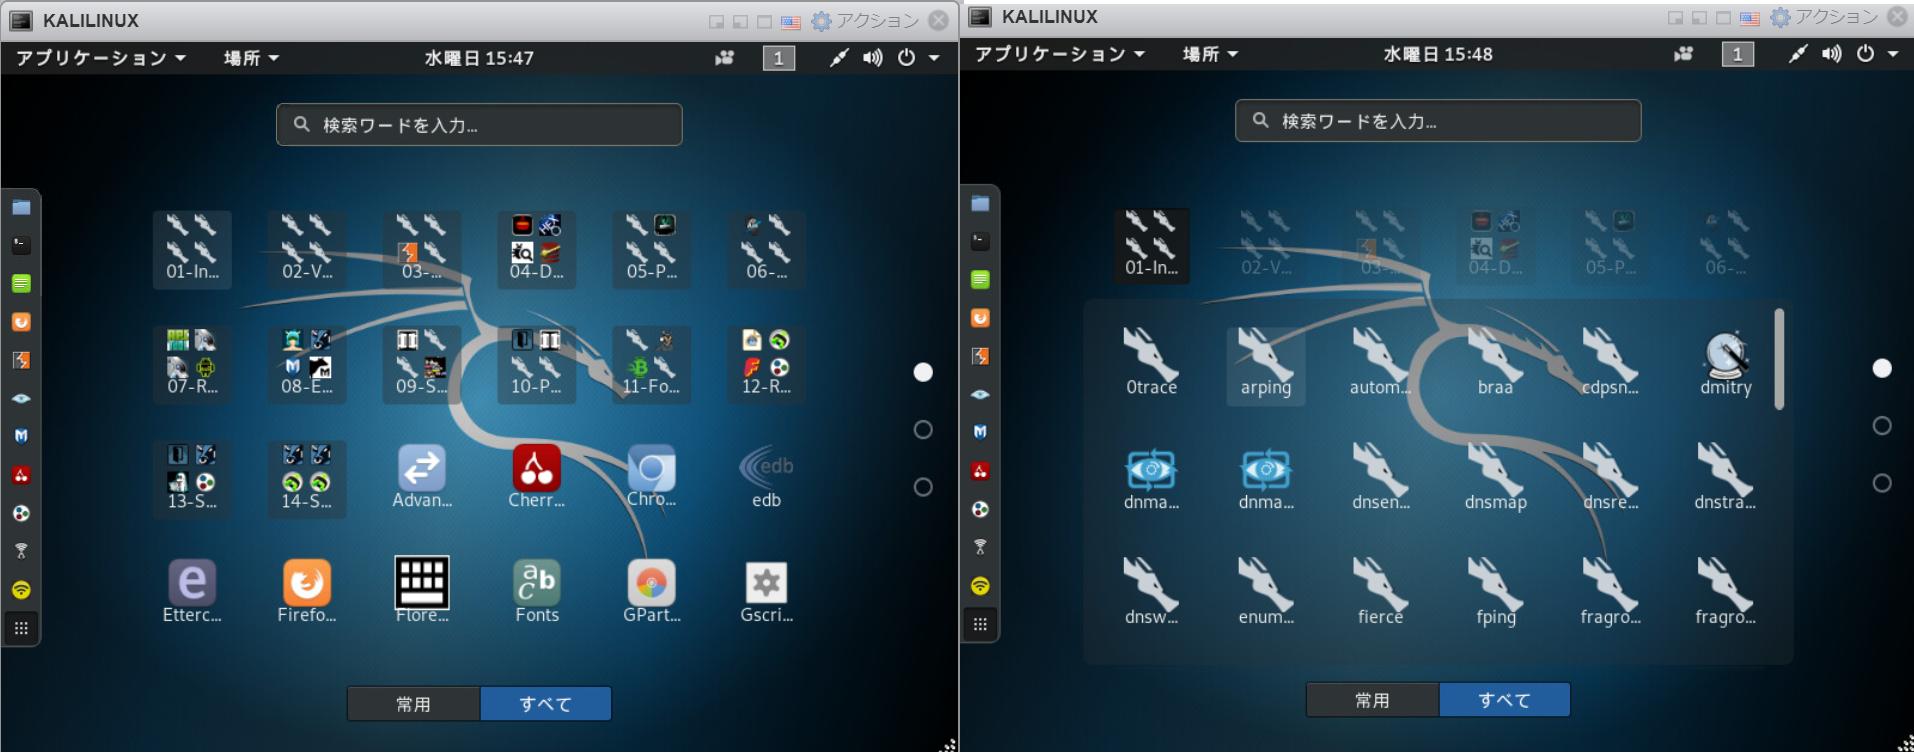 KaliLinux 画面